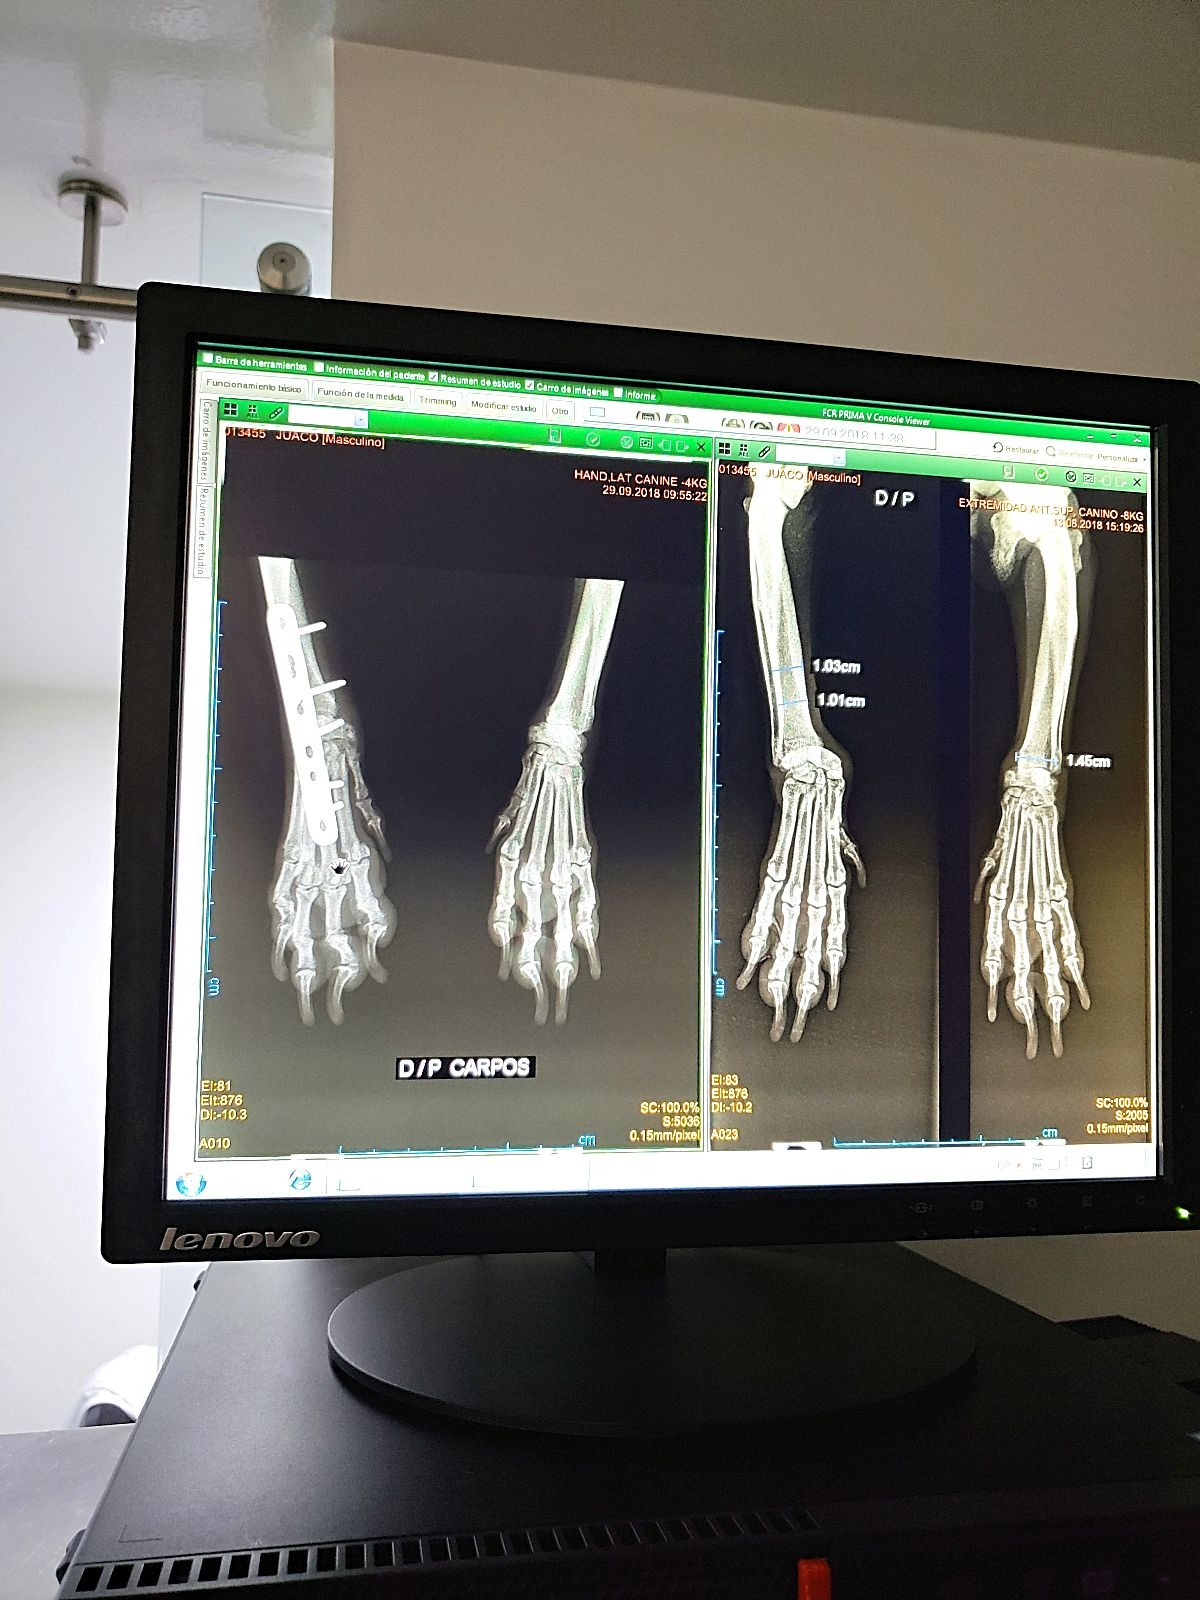 Röntgenfoto hond